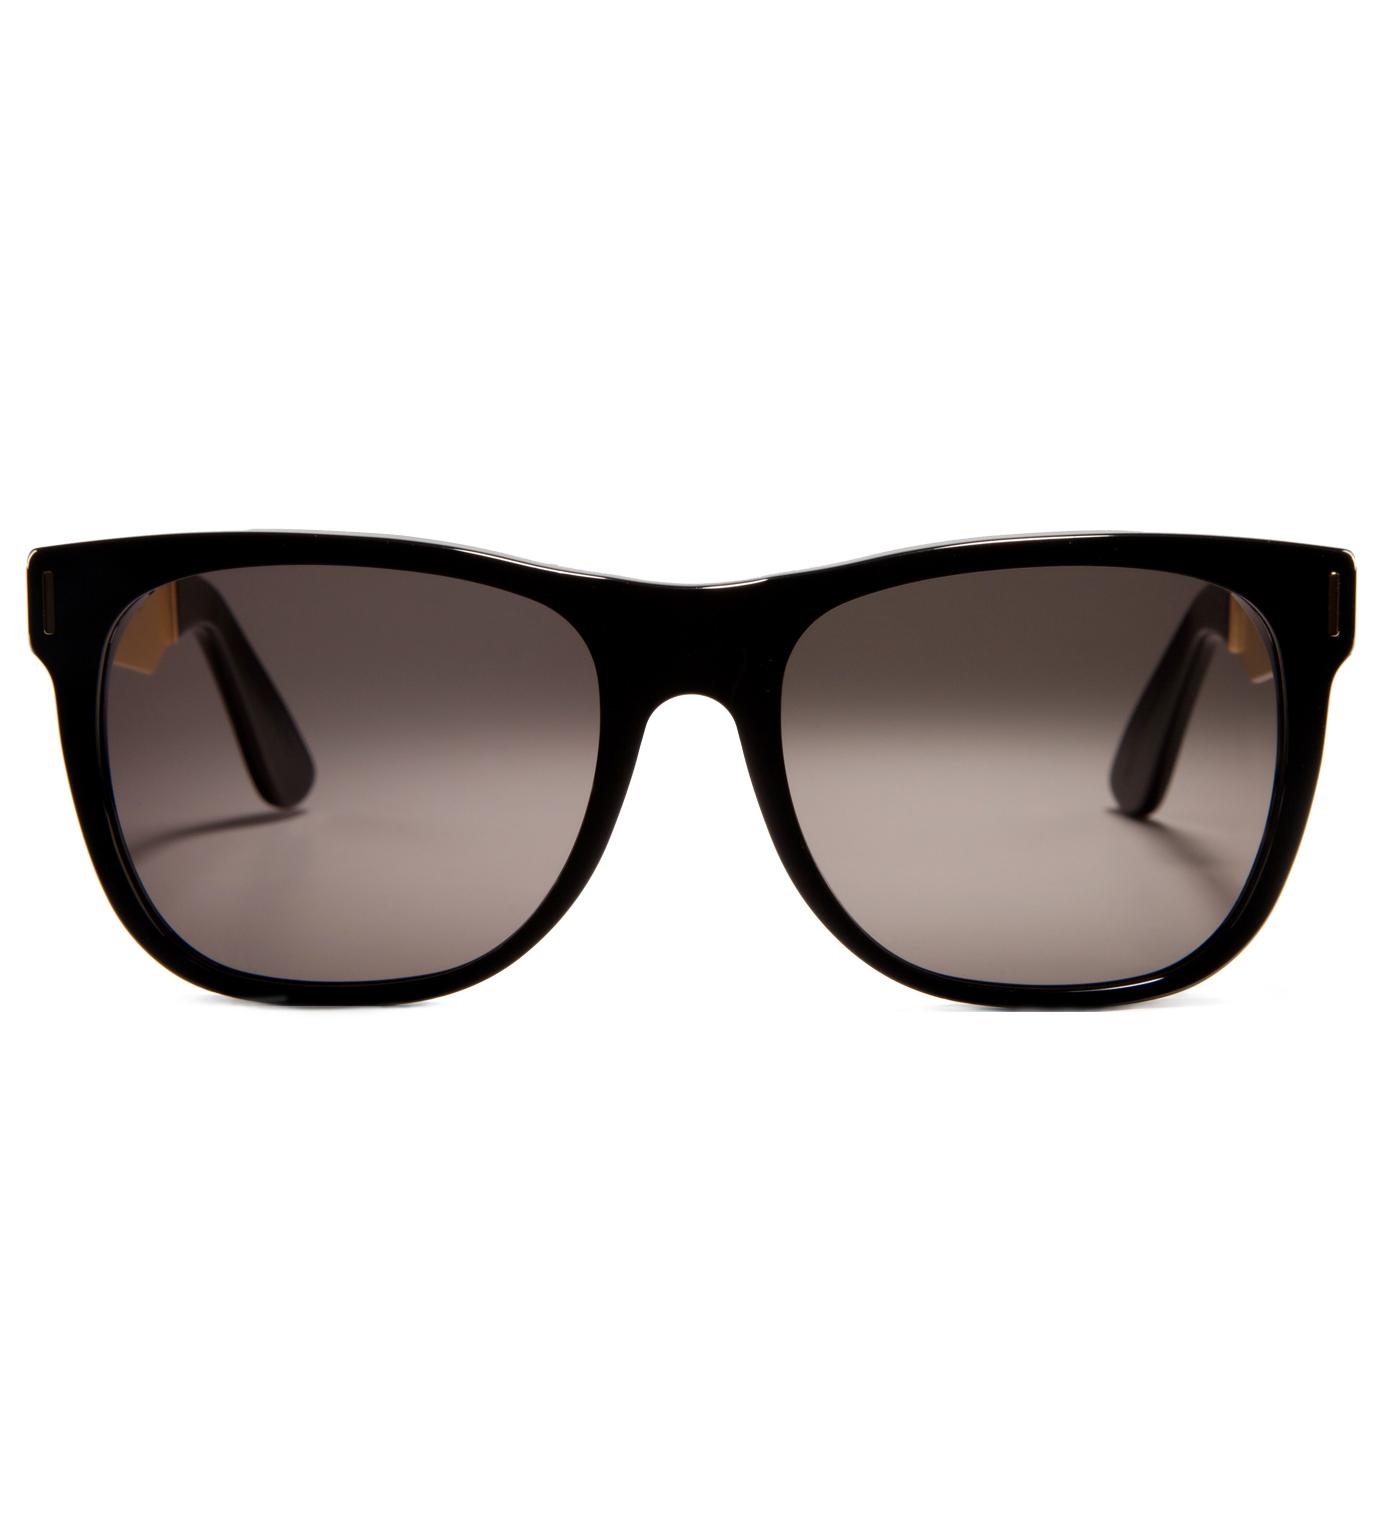 SUPER BY RETROSUPERFUTURE Classic Francis Black Sunglasses